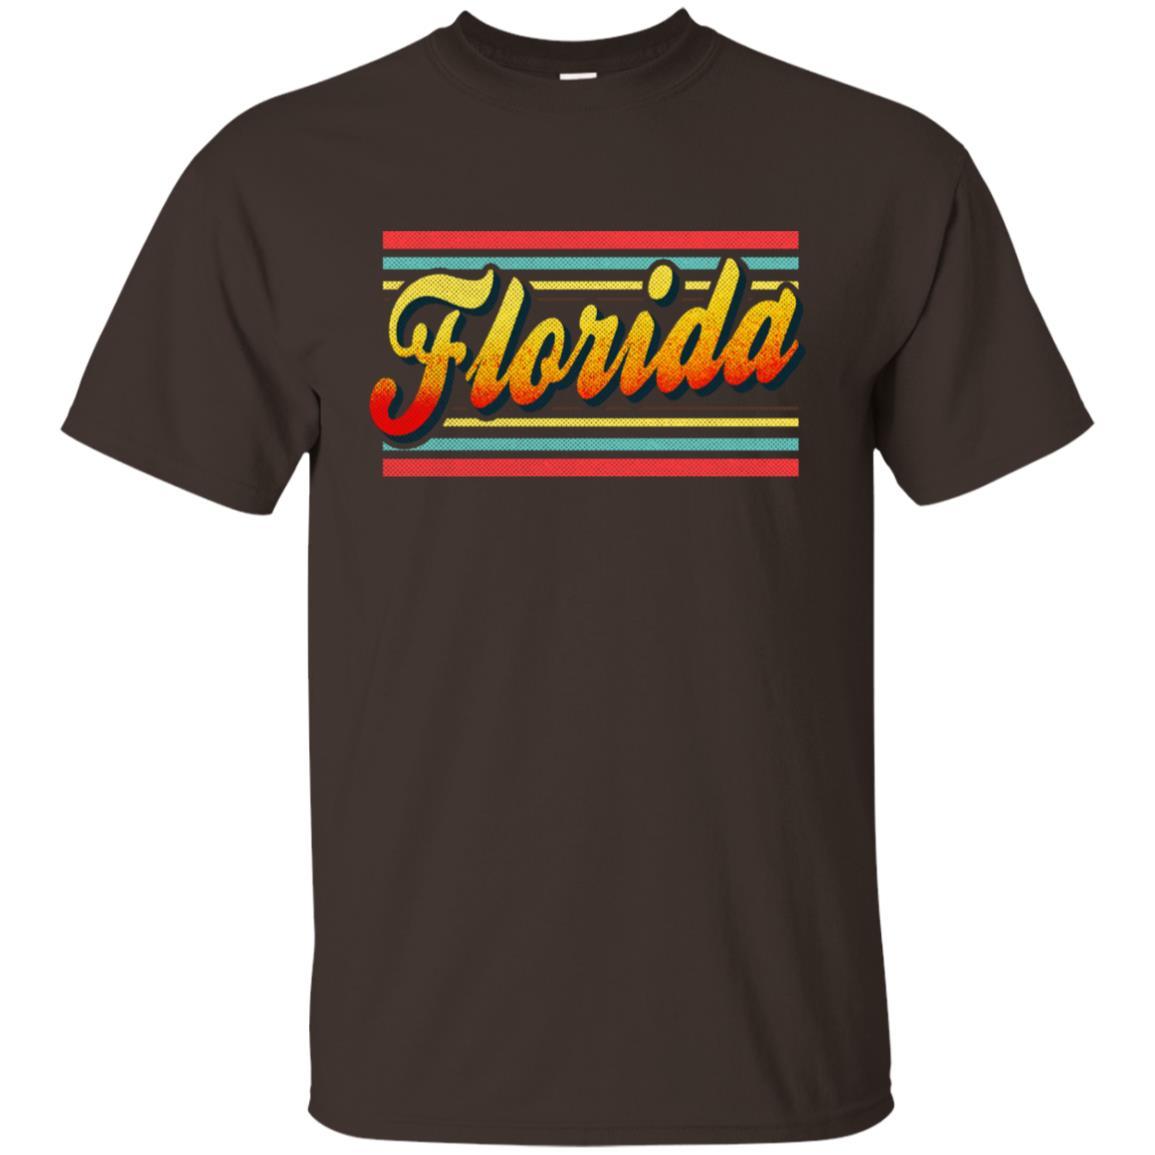 Florida Retro Vintage 80s Unisex Short Sleeve